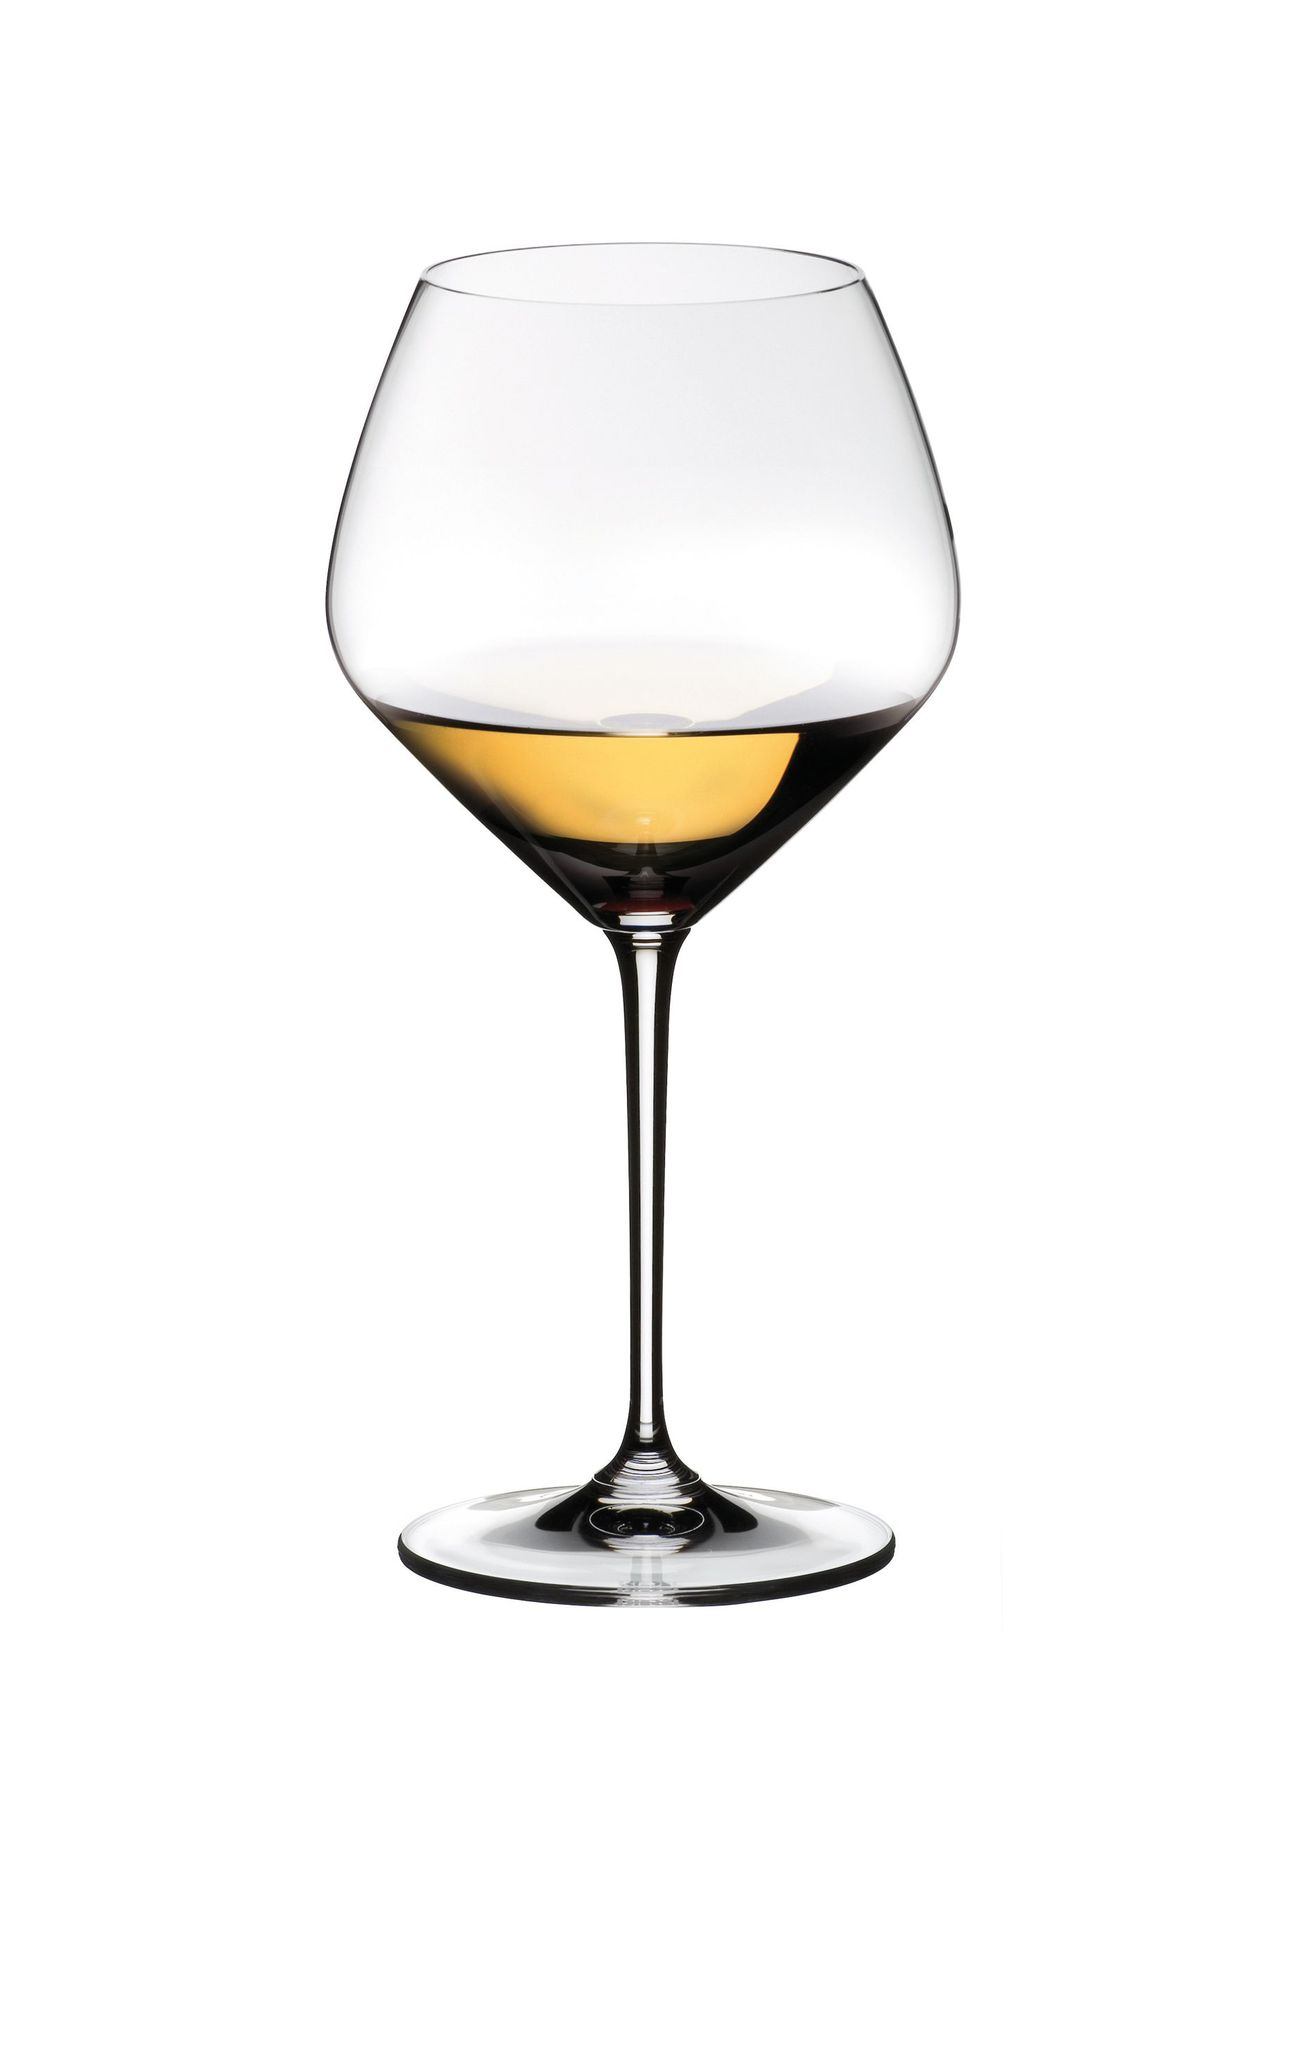 Бокалы Набор бокалов для белого вина 2 шт 670 мл Riedel Heart to Heart Oaked Chardonnay nabor-bokalov-dlya-belogo-vina-2-sht-670-ml-riedel-heart-to-heart-oaked-chardonnay-avstriya.jpg